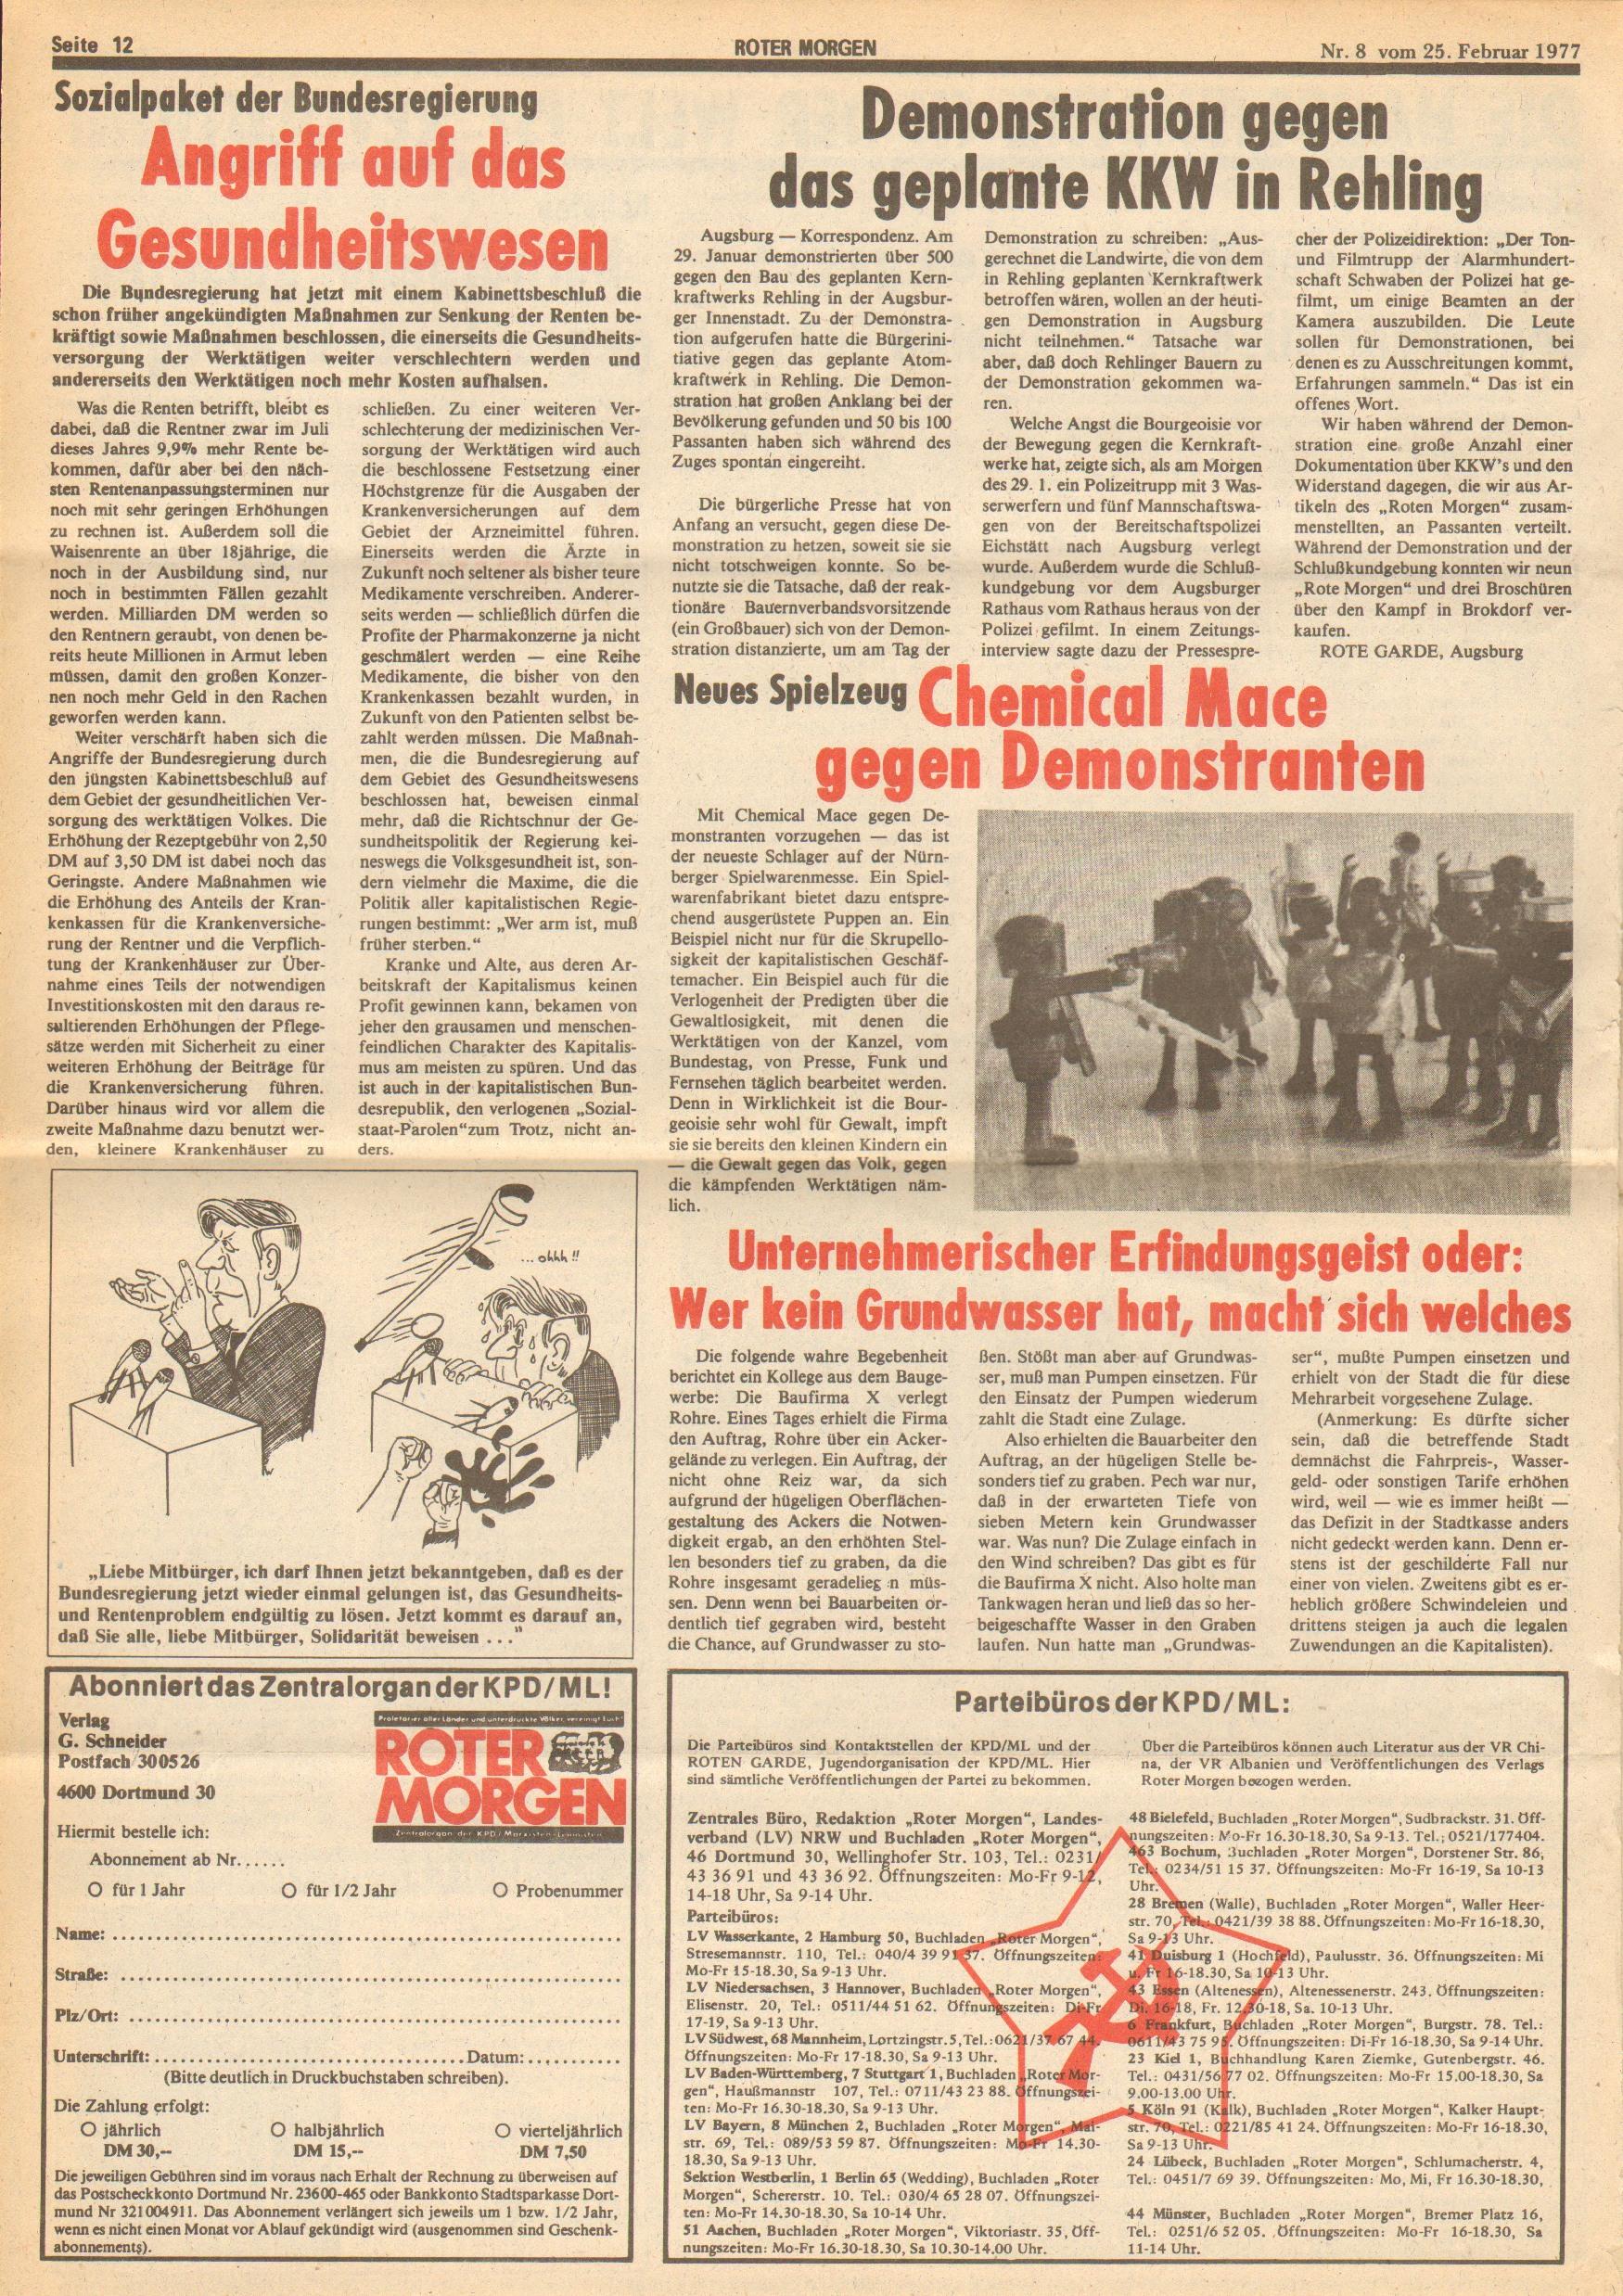 Roter Morgen, 11. Jg.,25. Februar 1977, Nr. 8, Seite 12